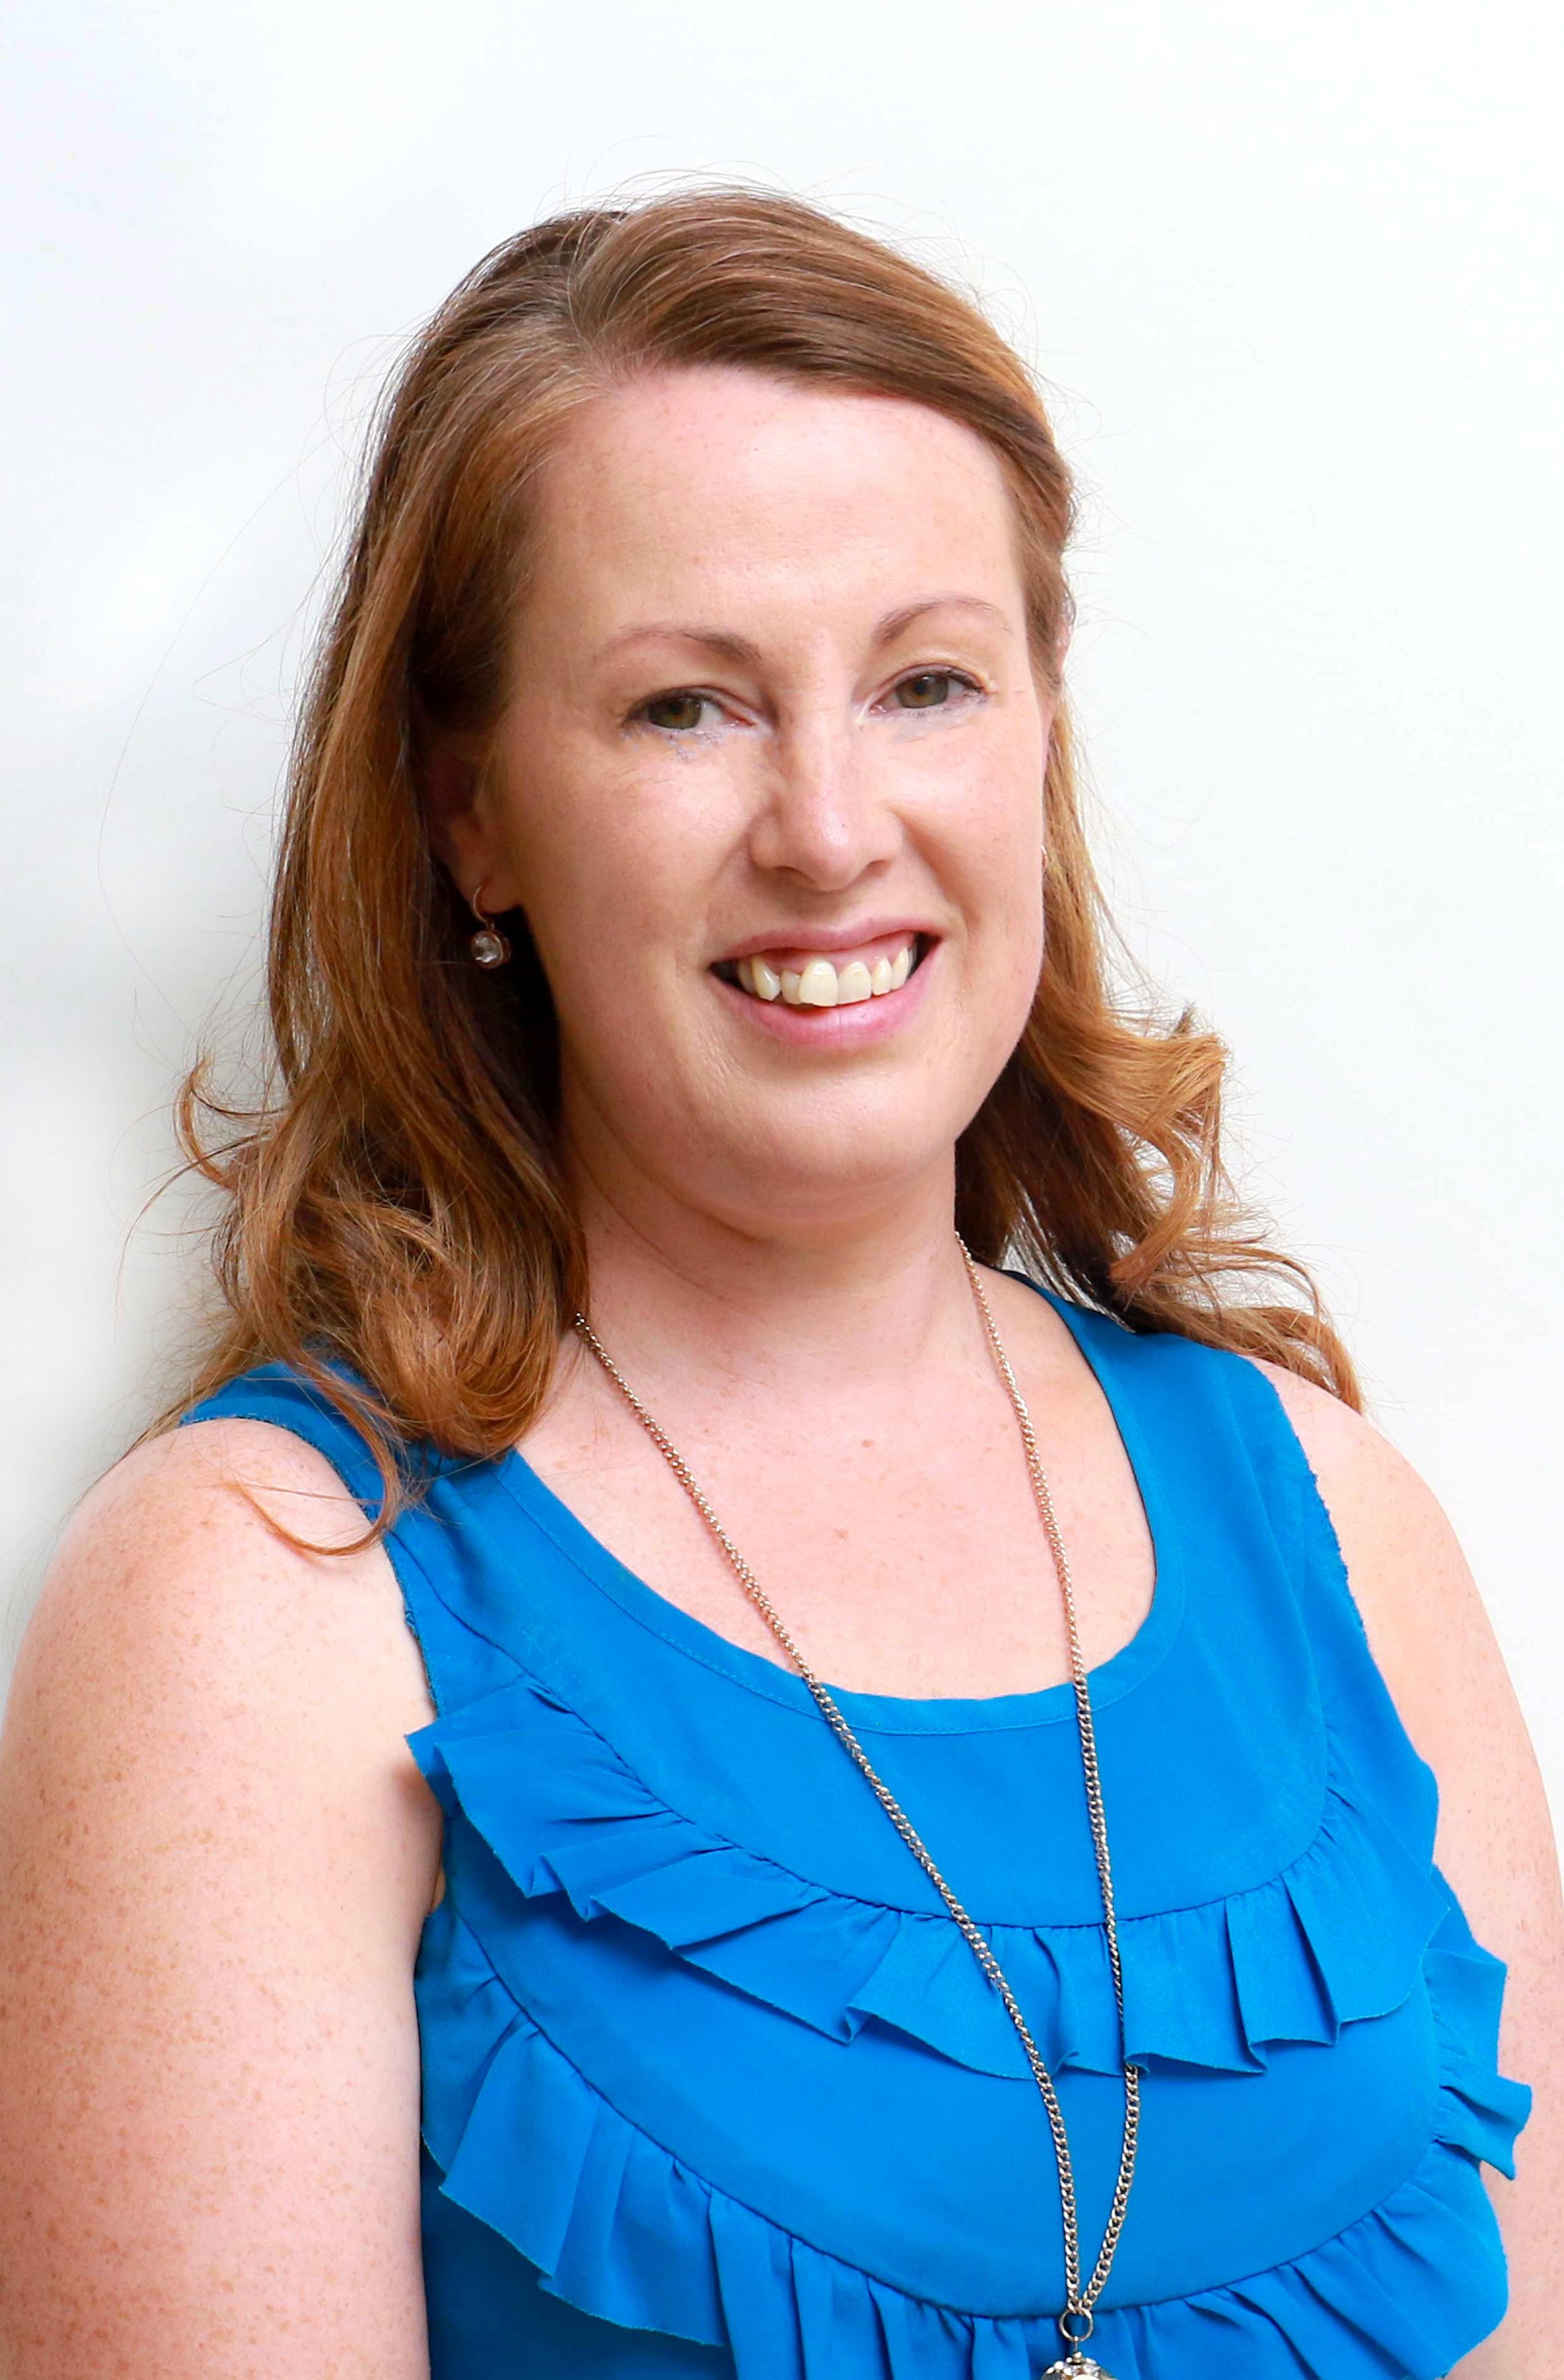 Siobhan McGinnity